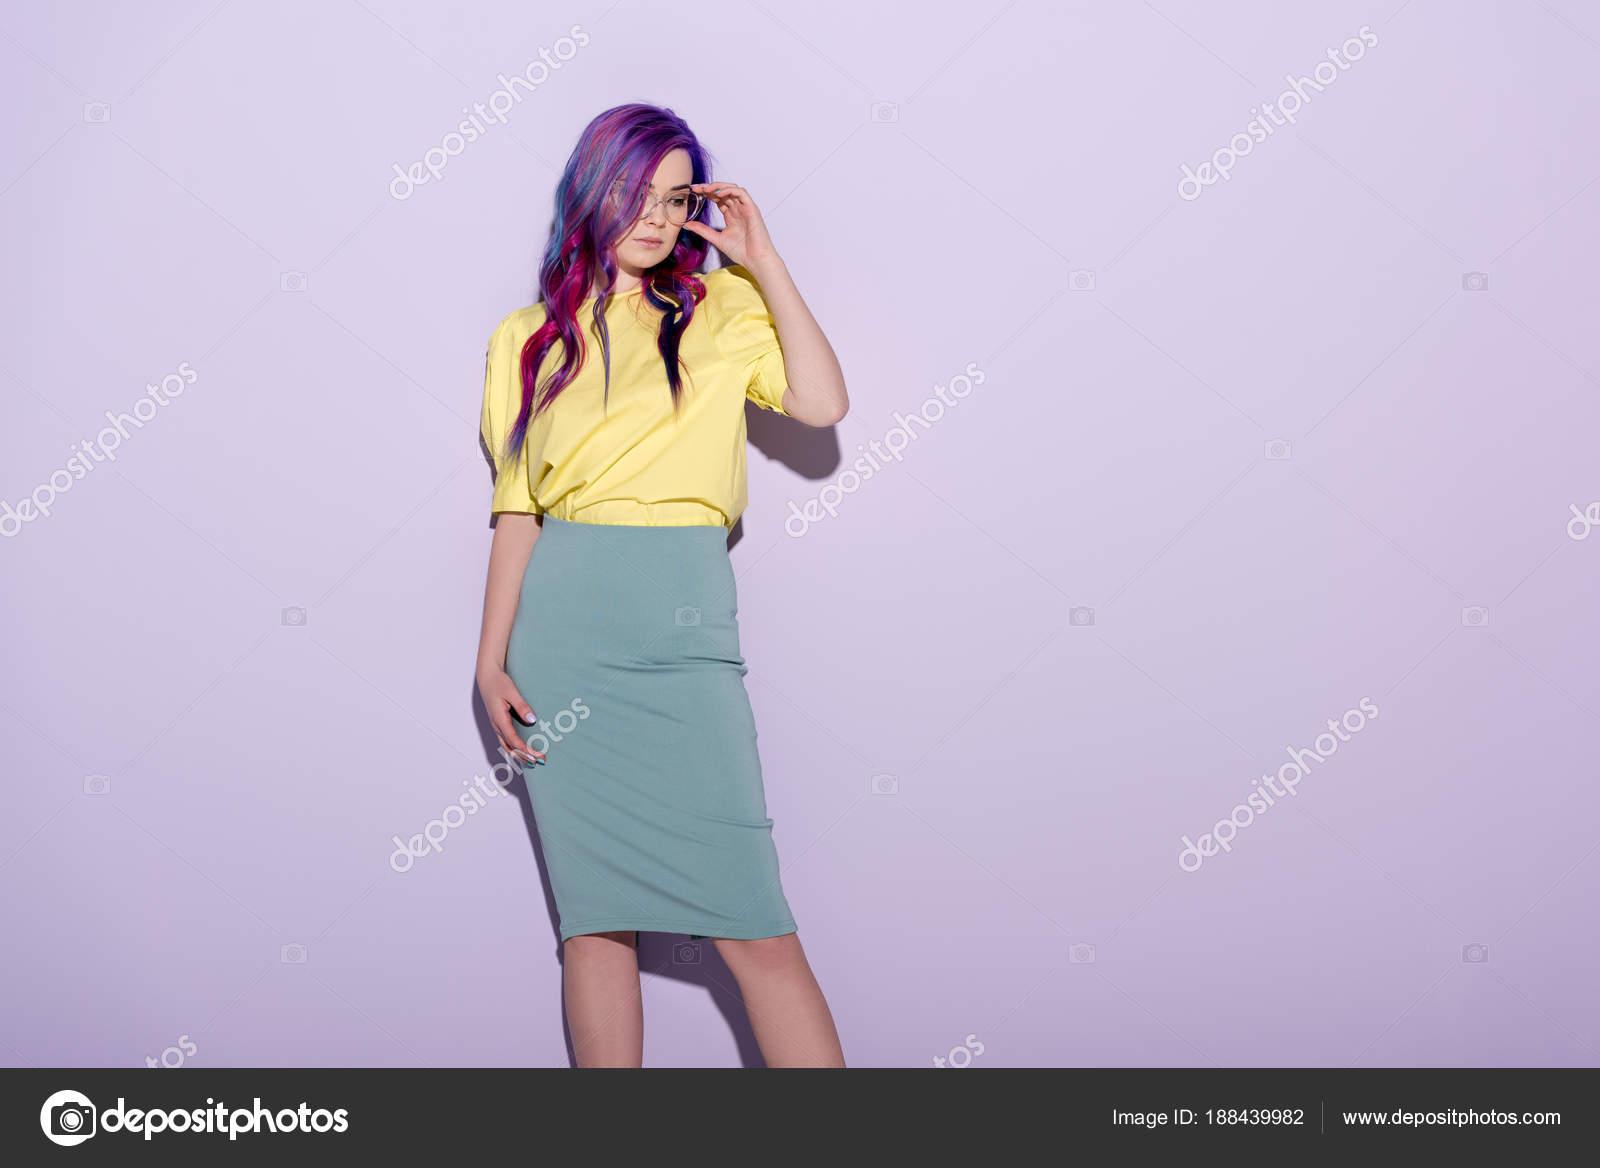 Beautiful Young Woman Colorful Hair Stylish Eyeglasses Pink Stock